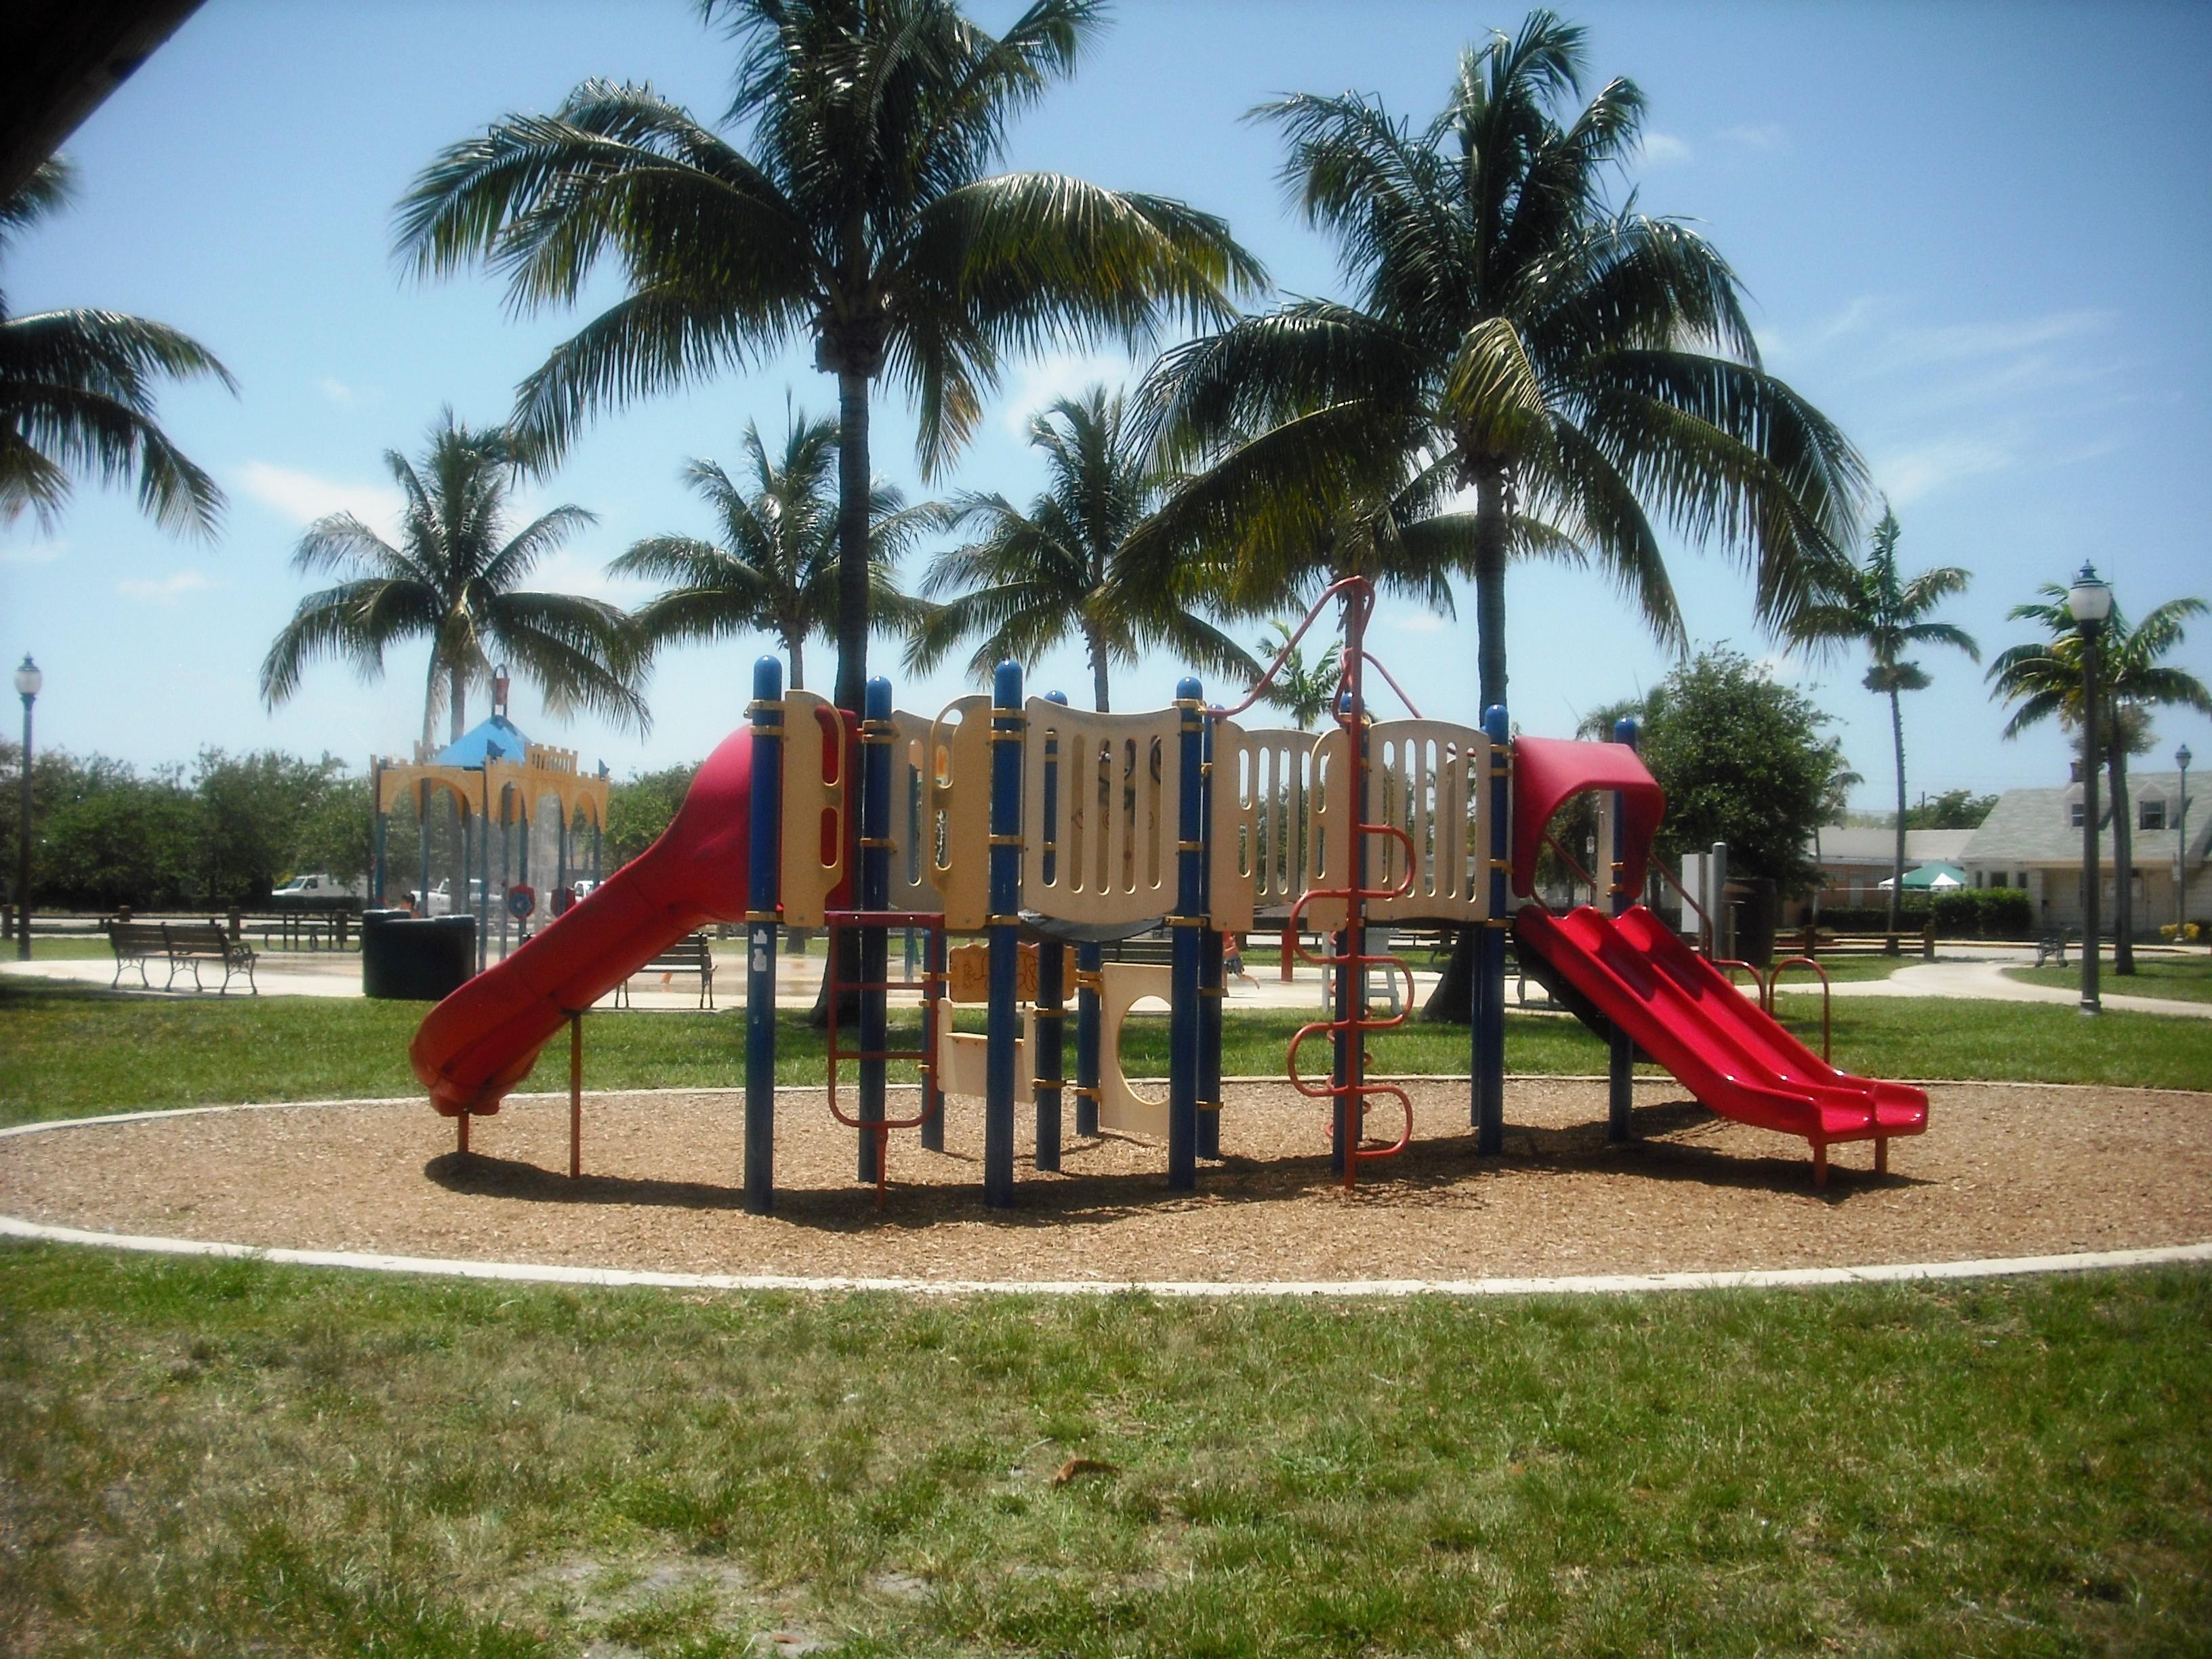 South olive park wpb4 26 2013 025 west palm beach parks - Palm beach gardens recreation center ...